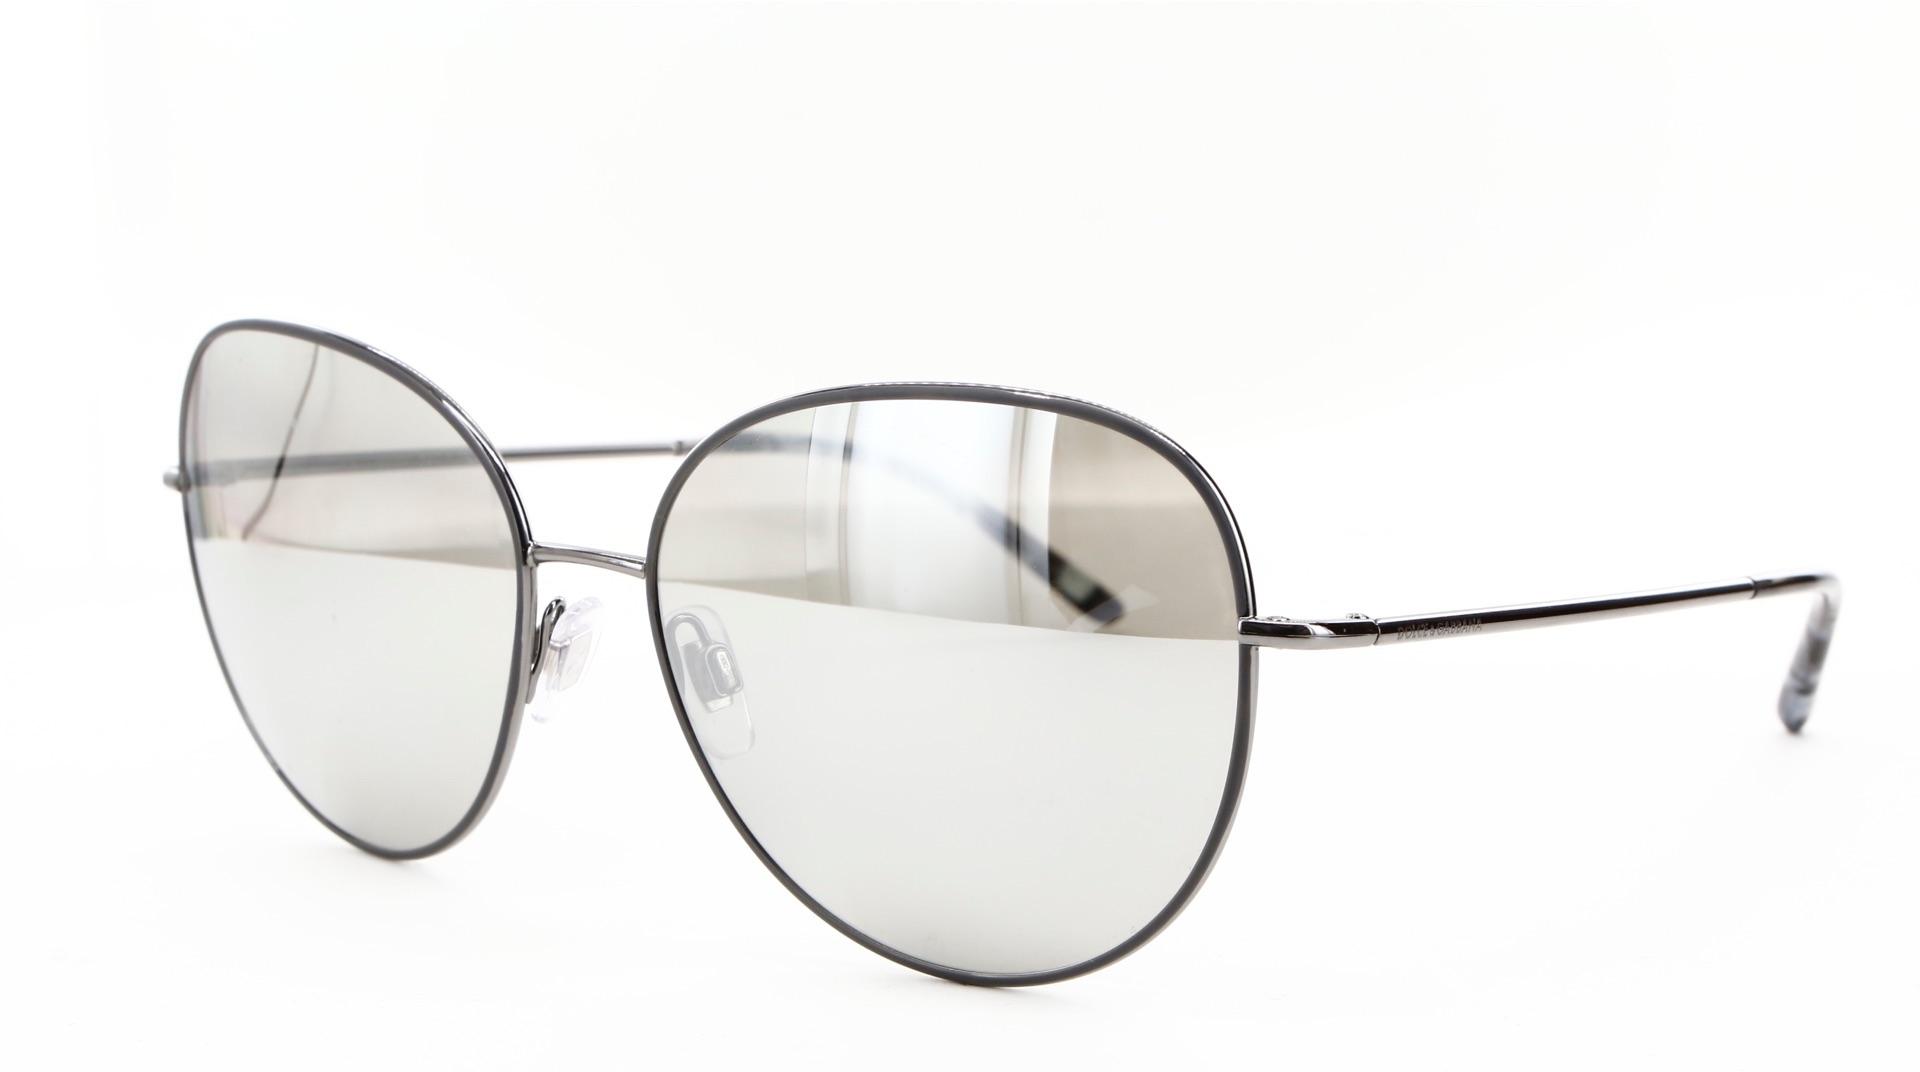 Dolce & Gabbana - ref: 79395